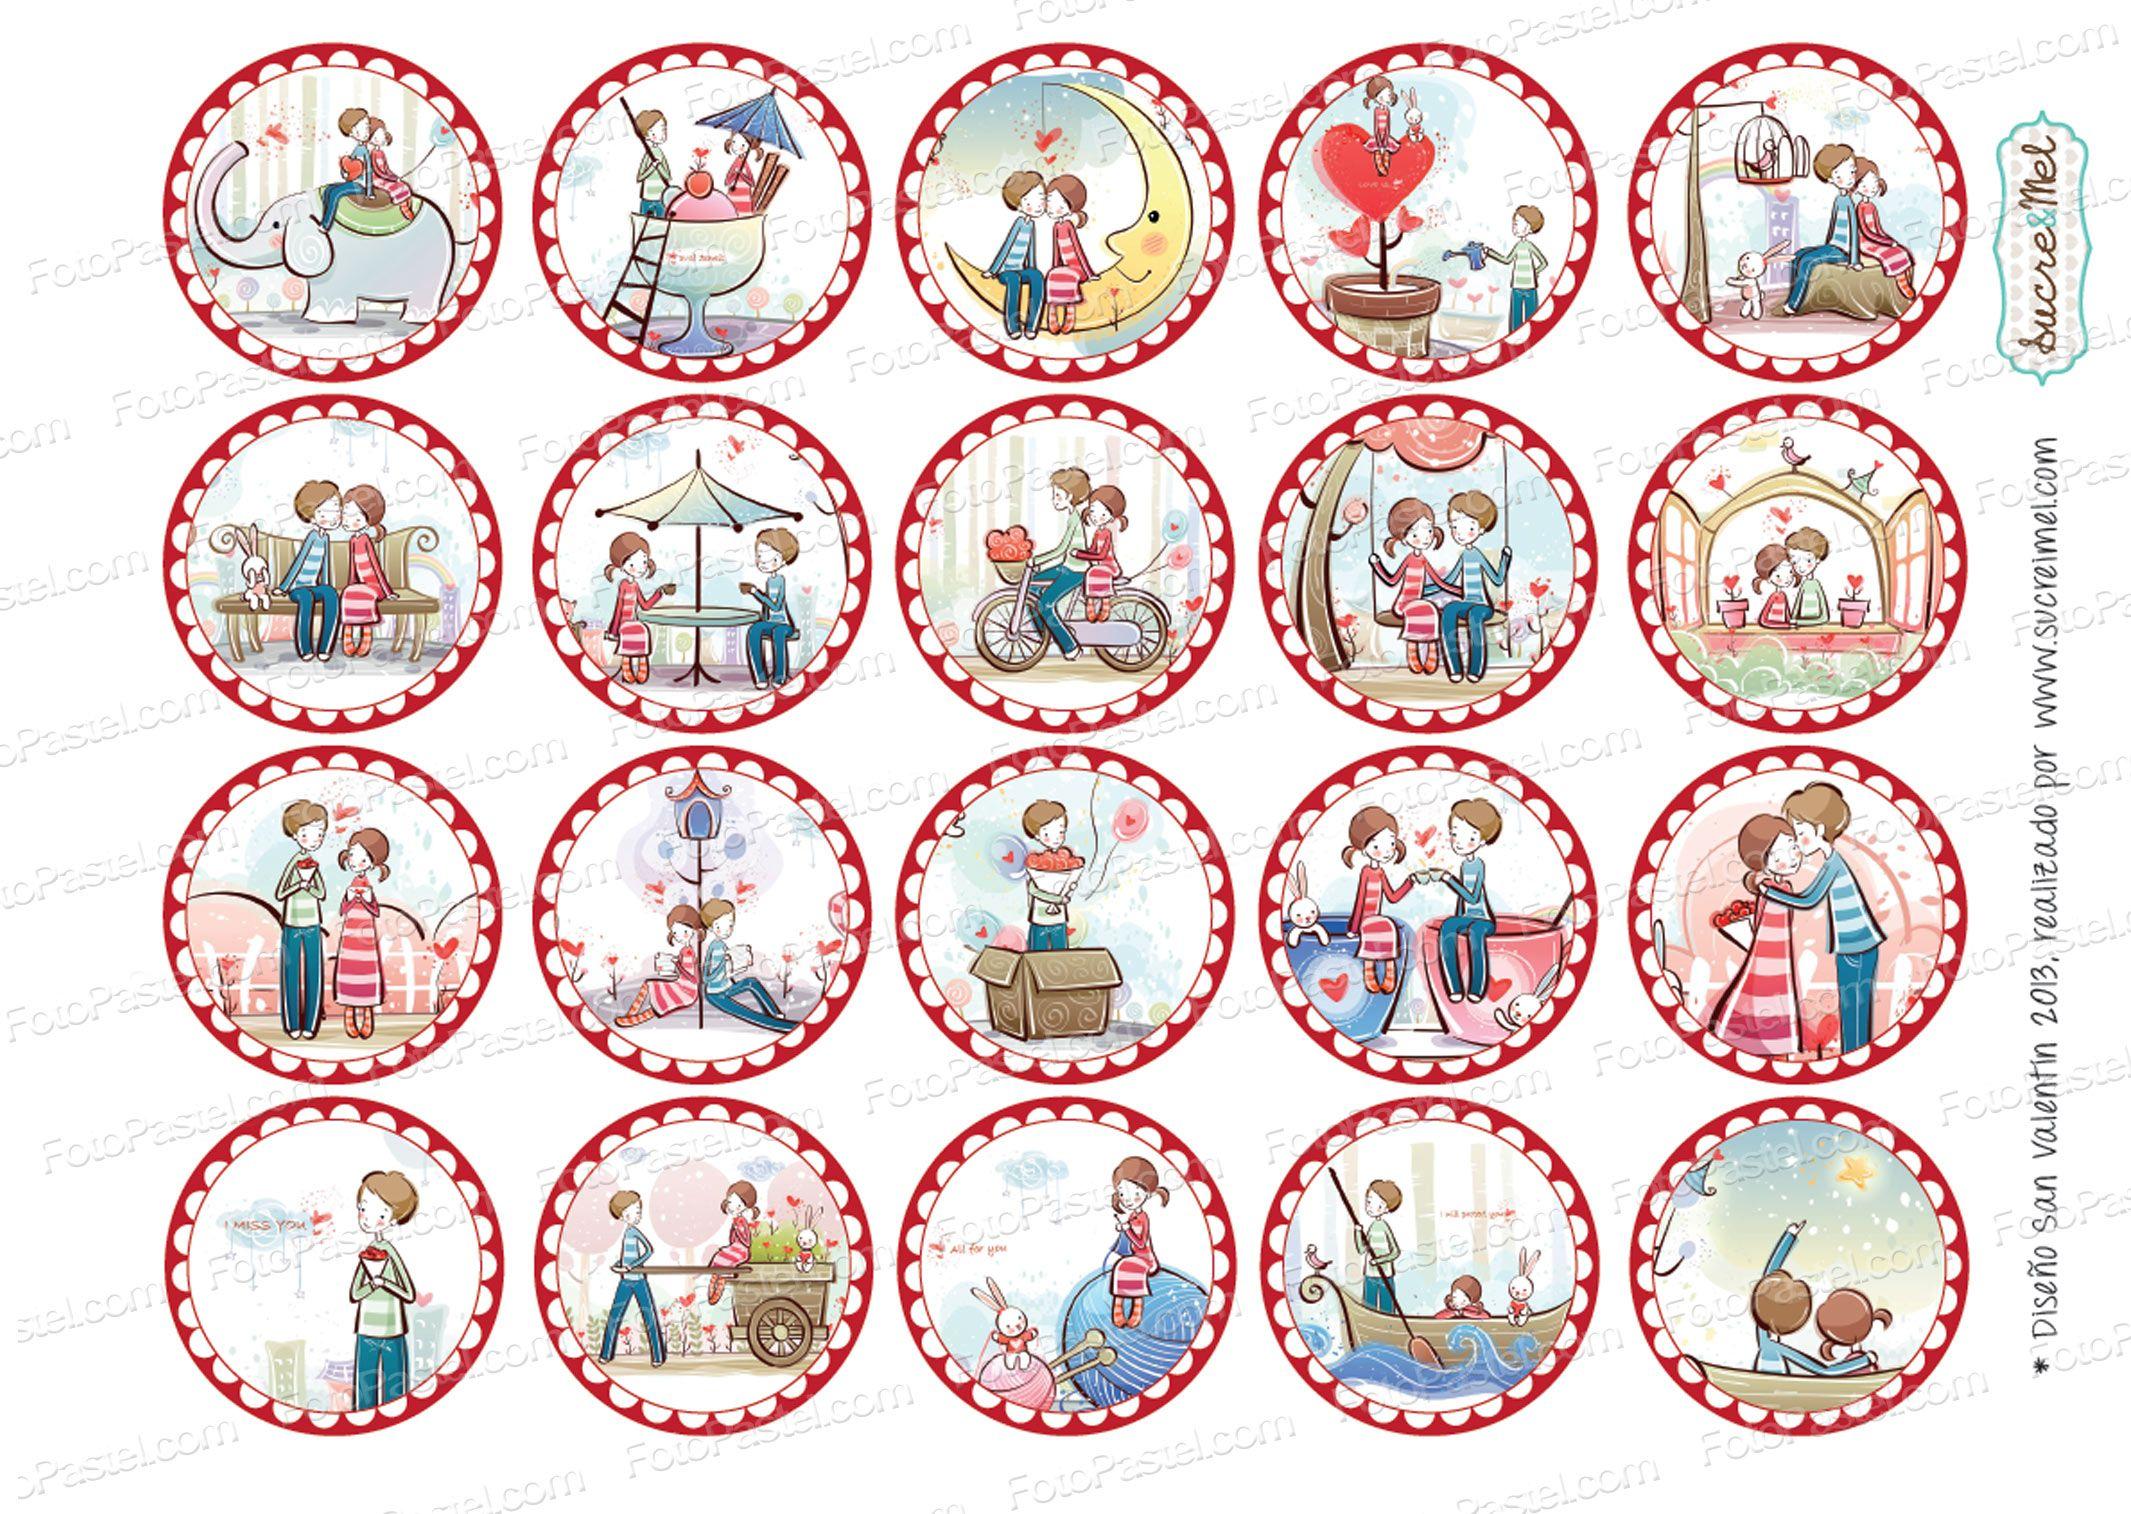 Papel decorativo buscar con google san valentin for Fotos de papel decorativo